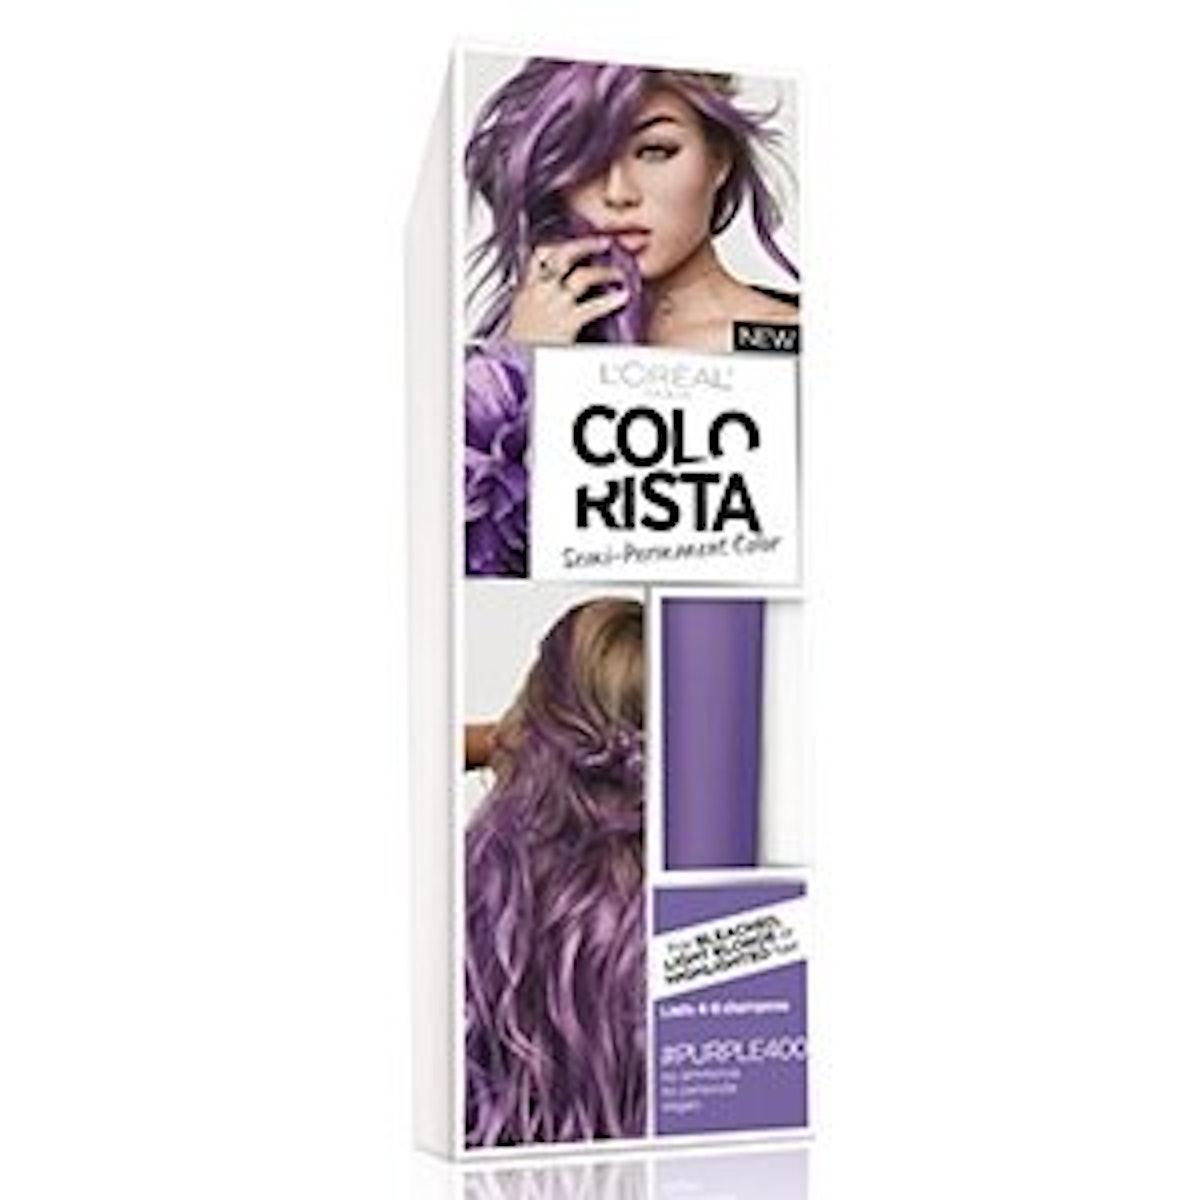 L'Oréal Colorista Semi Permanent Hair Color